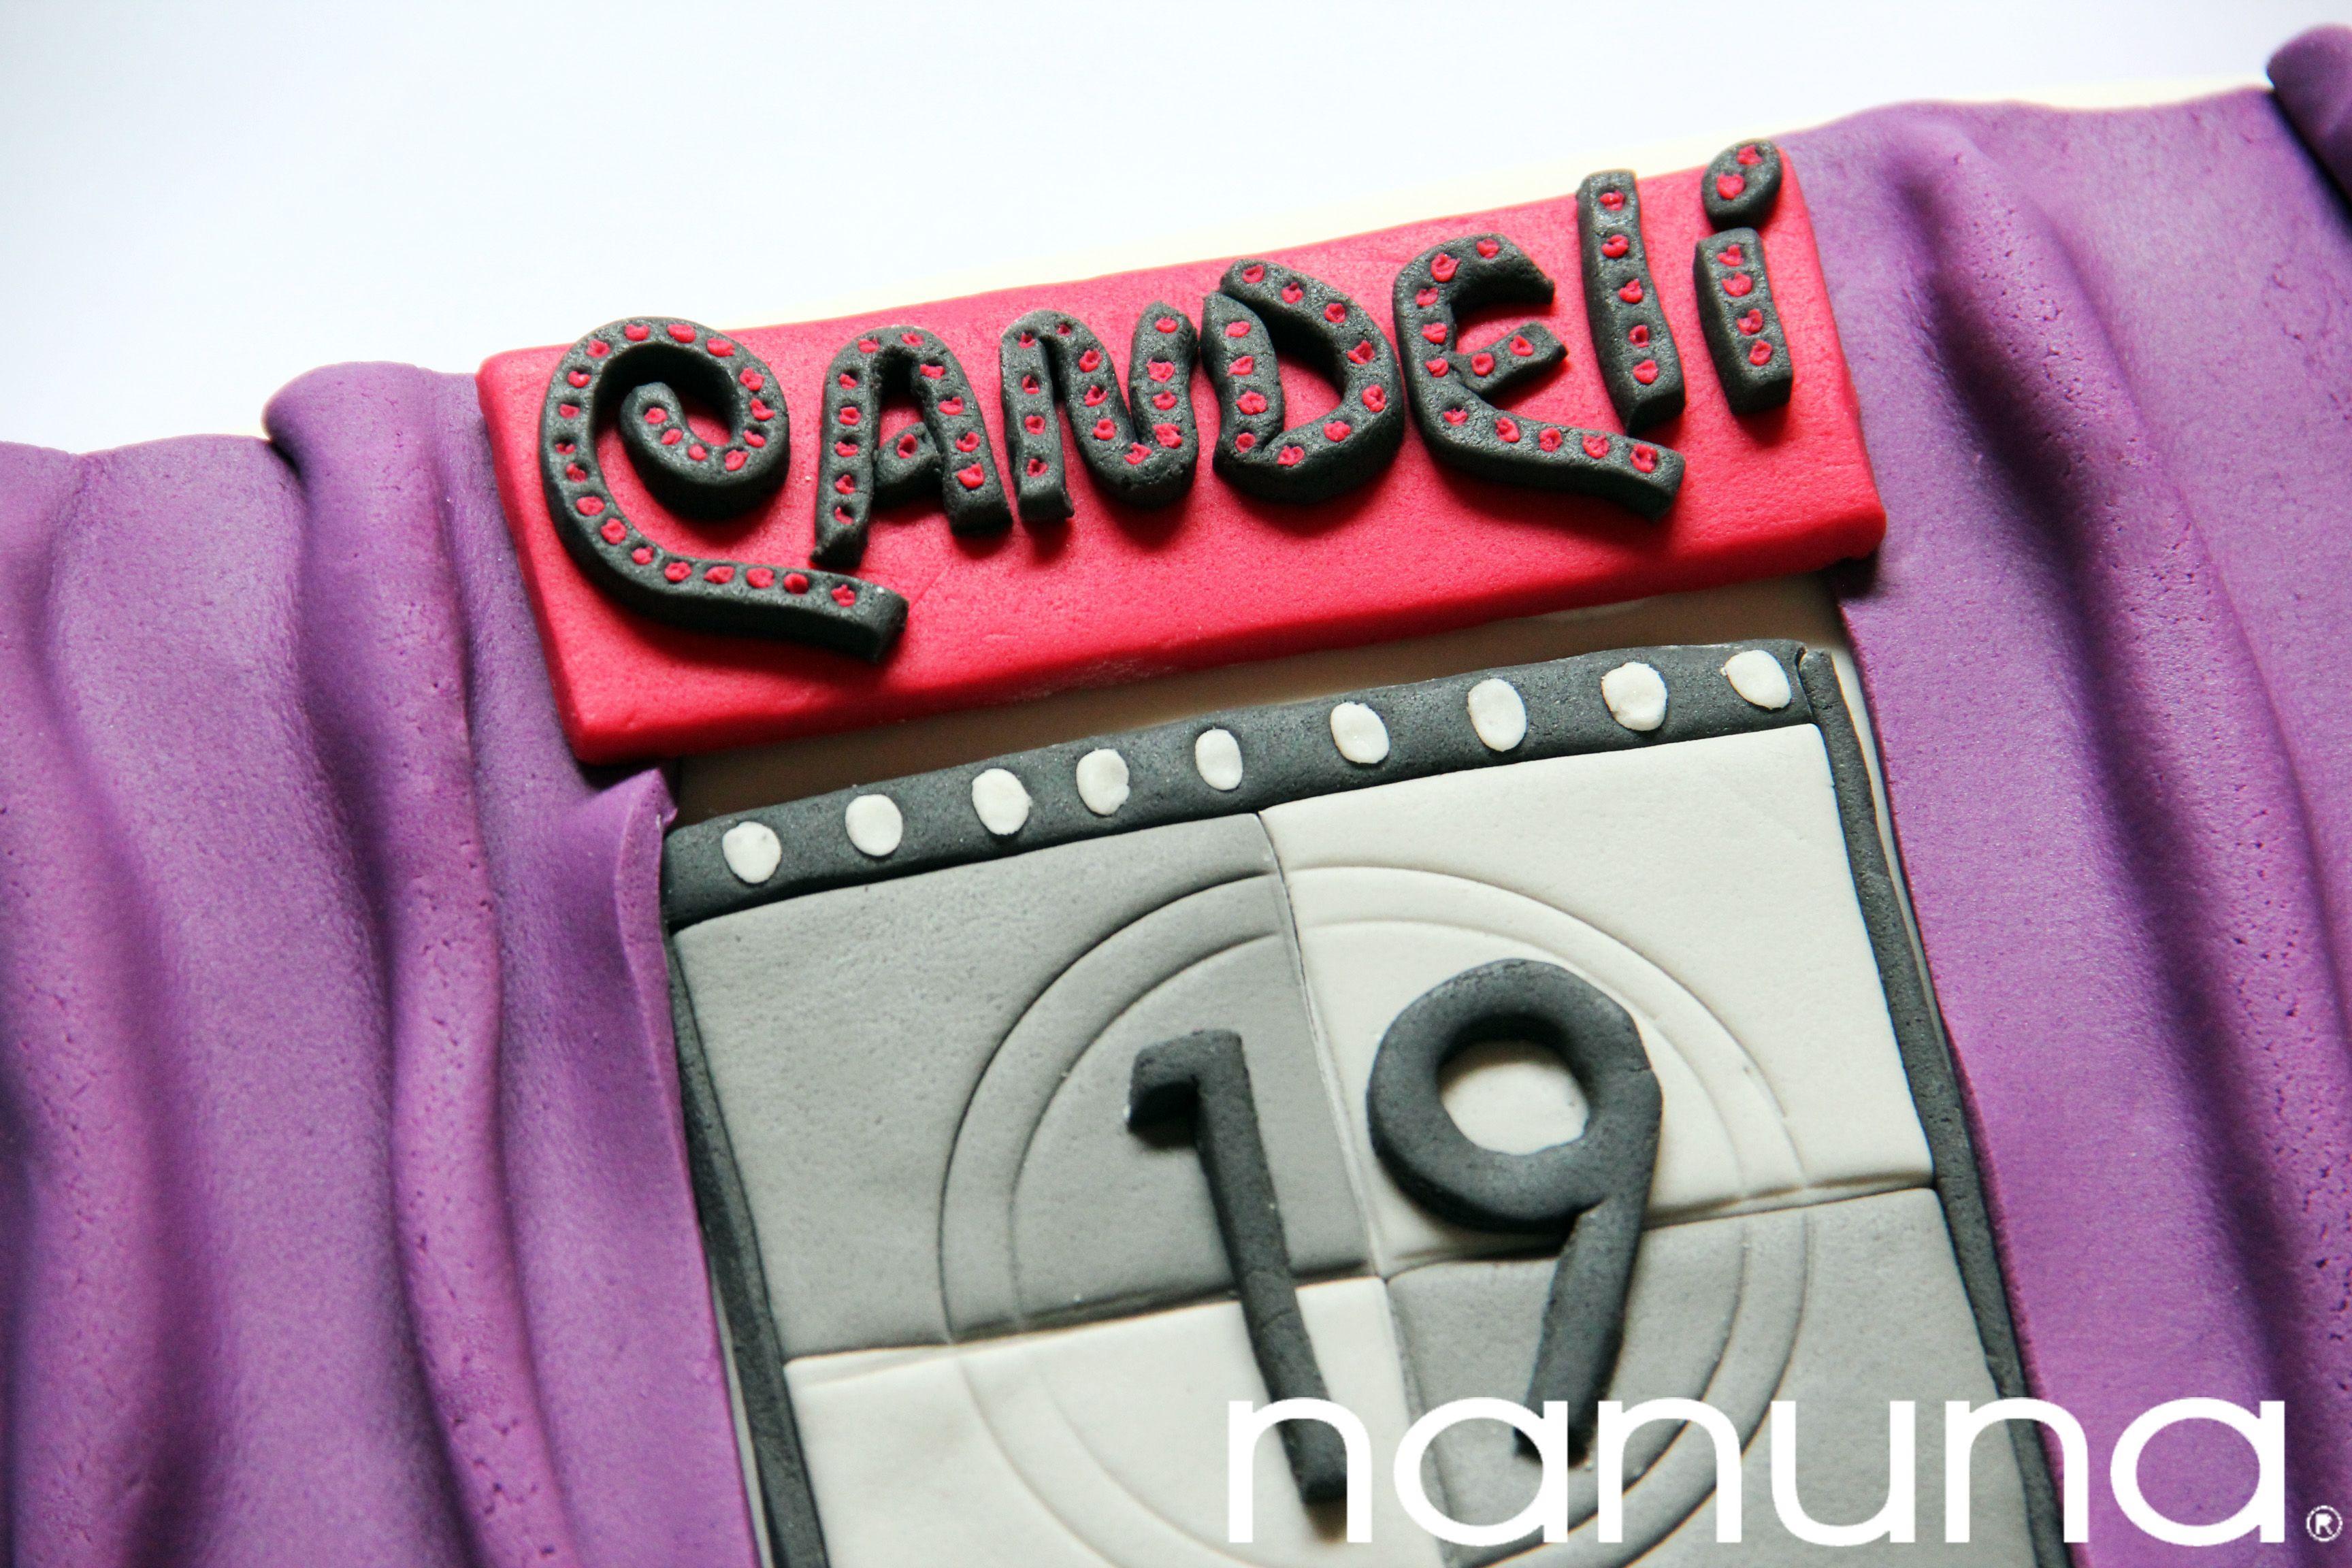 Torta personalizada: Telon teatral, cuenta regresiva, nombre al estilo Cabaret. #Cupcakes #Tortas #Argentina #Nanuna Conocenos en http://nanuna.com.ar/